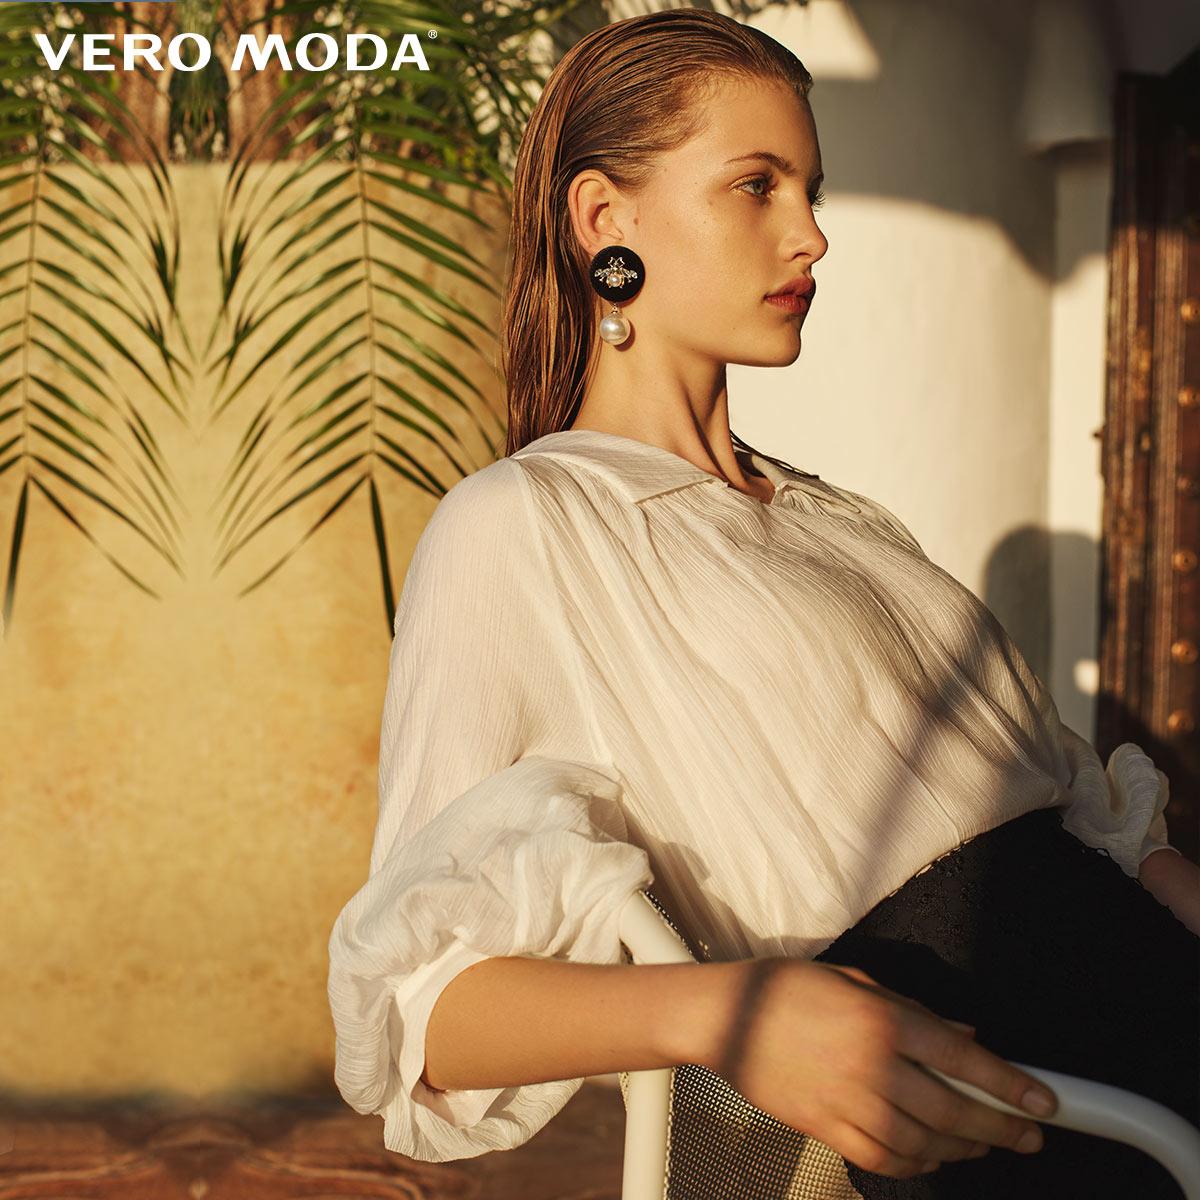 Vero Moda Women's Creased Fabric Turn-down Collar Elbow Sleeves Tops | 31926X516